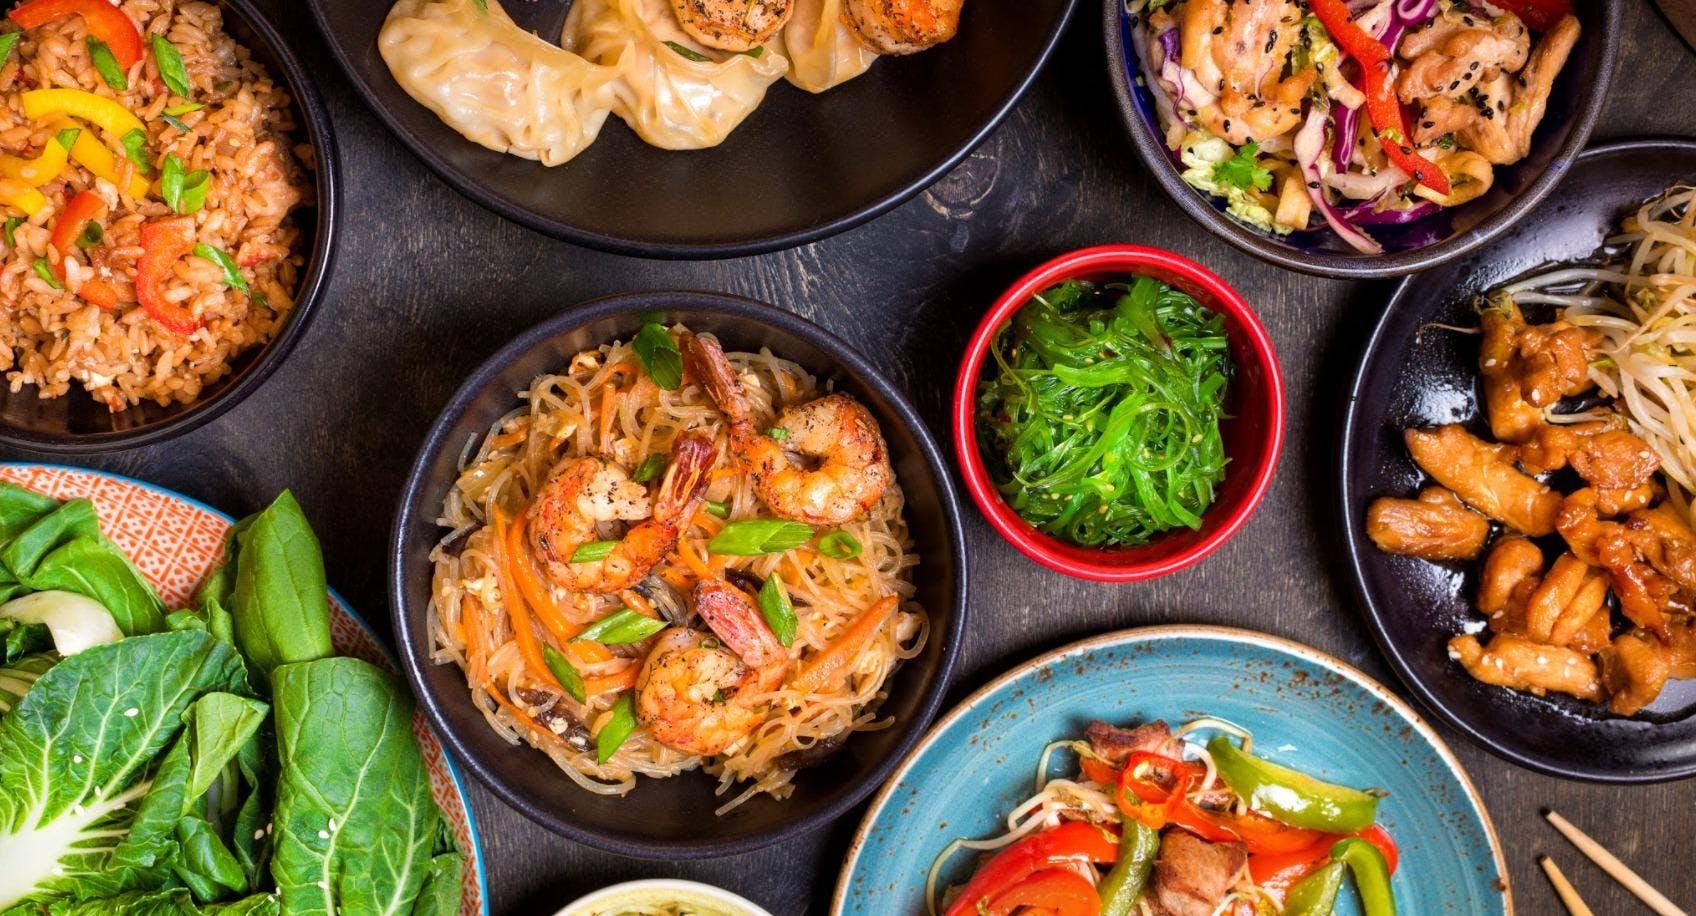 Nhat Long Restaurant